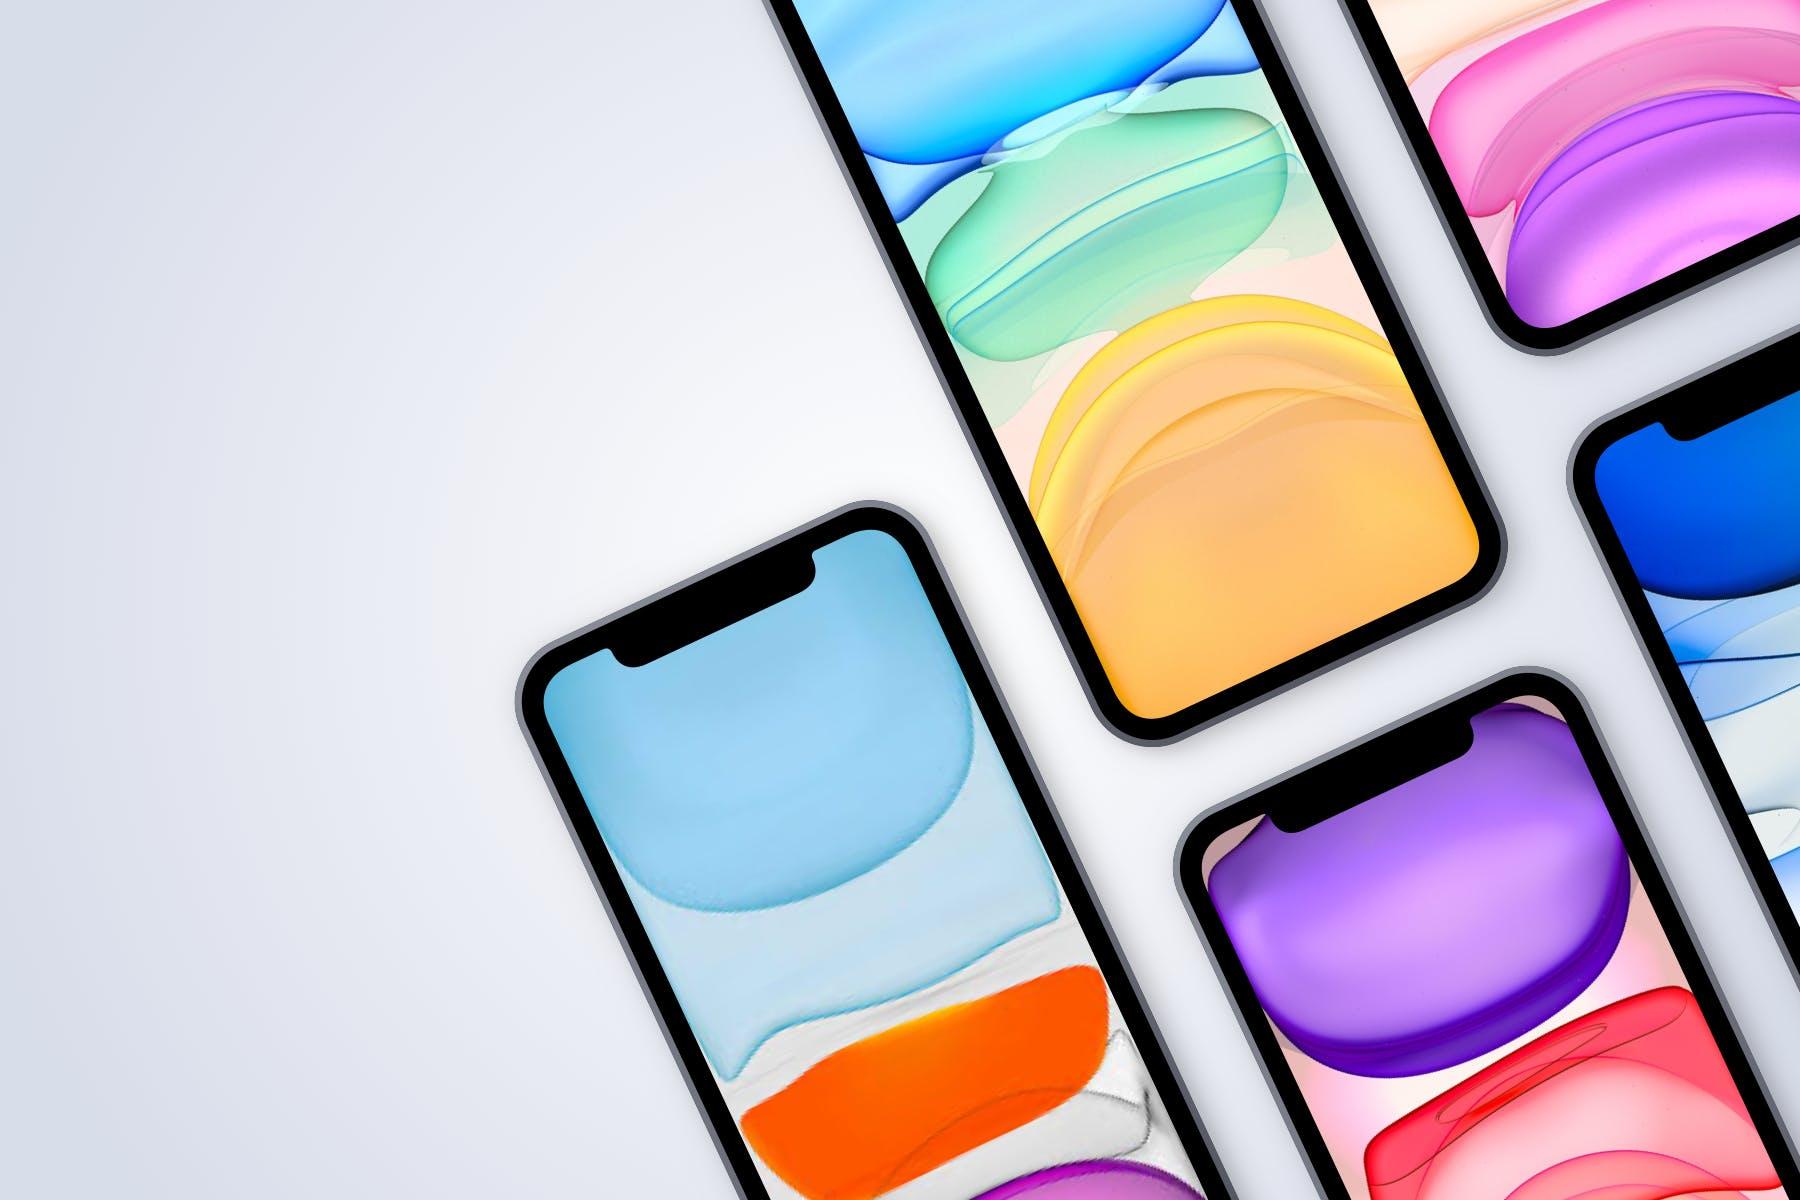 逼真苹果手机iPhone 12 Pro屏幕演示样机Sketch模板素材 iPhone 12 Pro – Sketch Mockup – 4 Different Scenes插图1